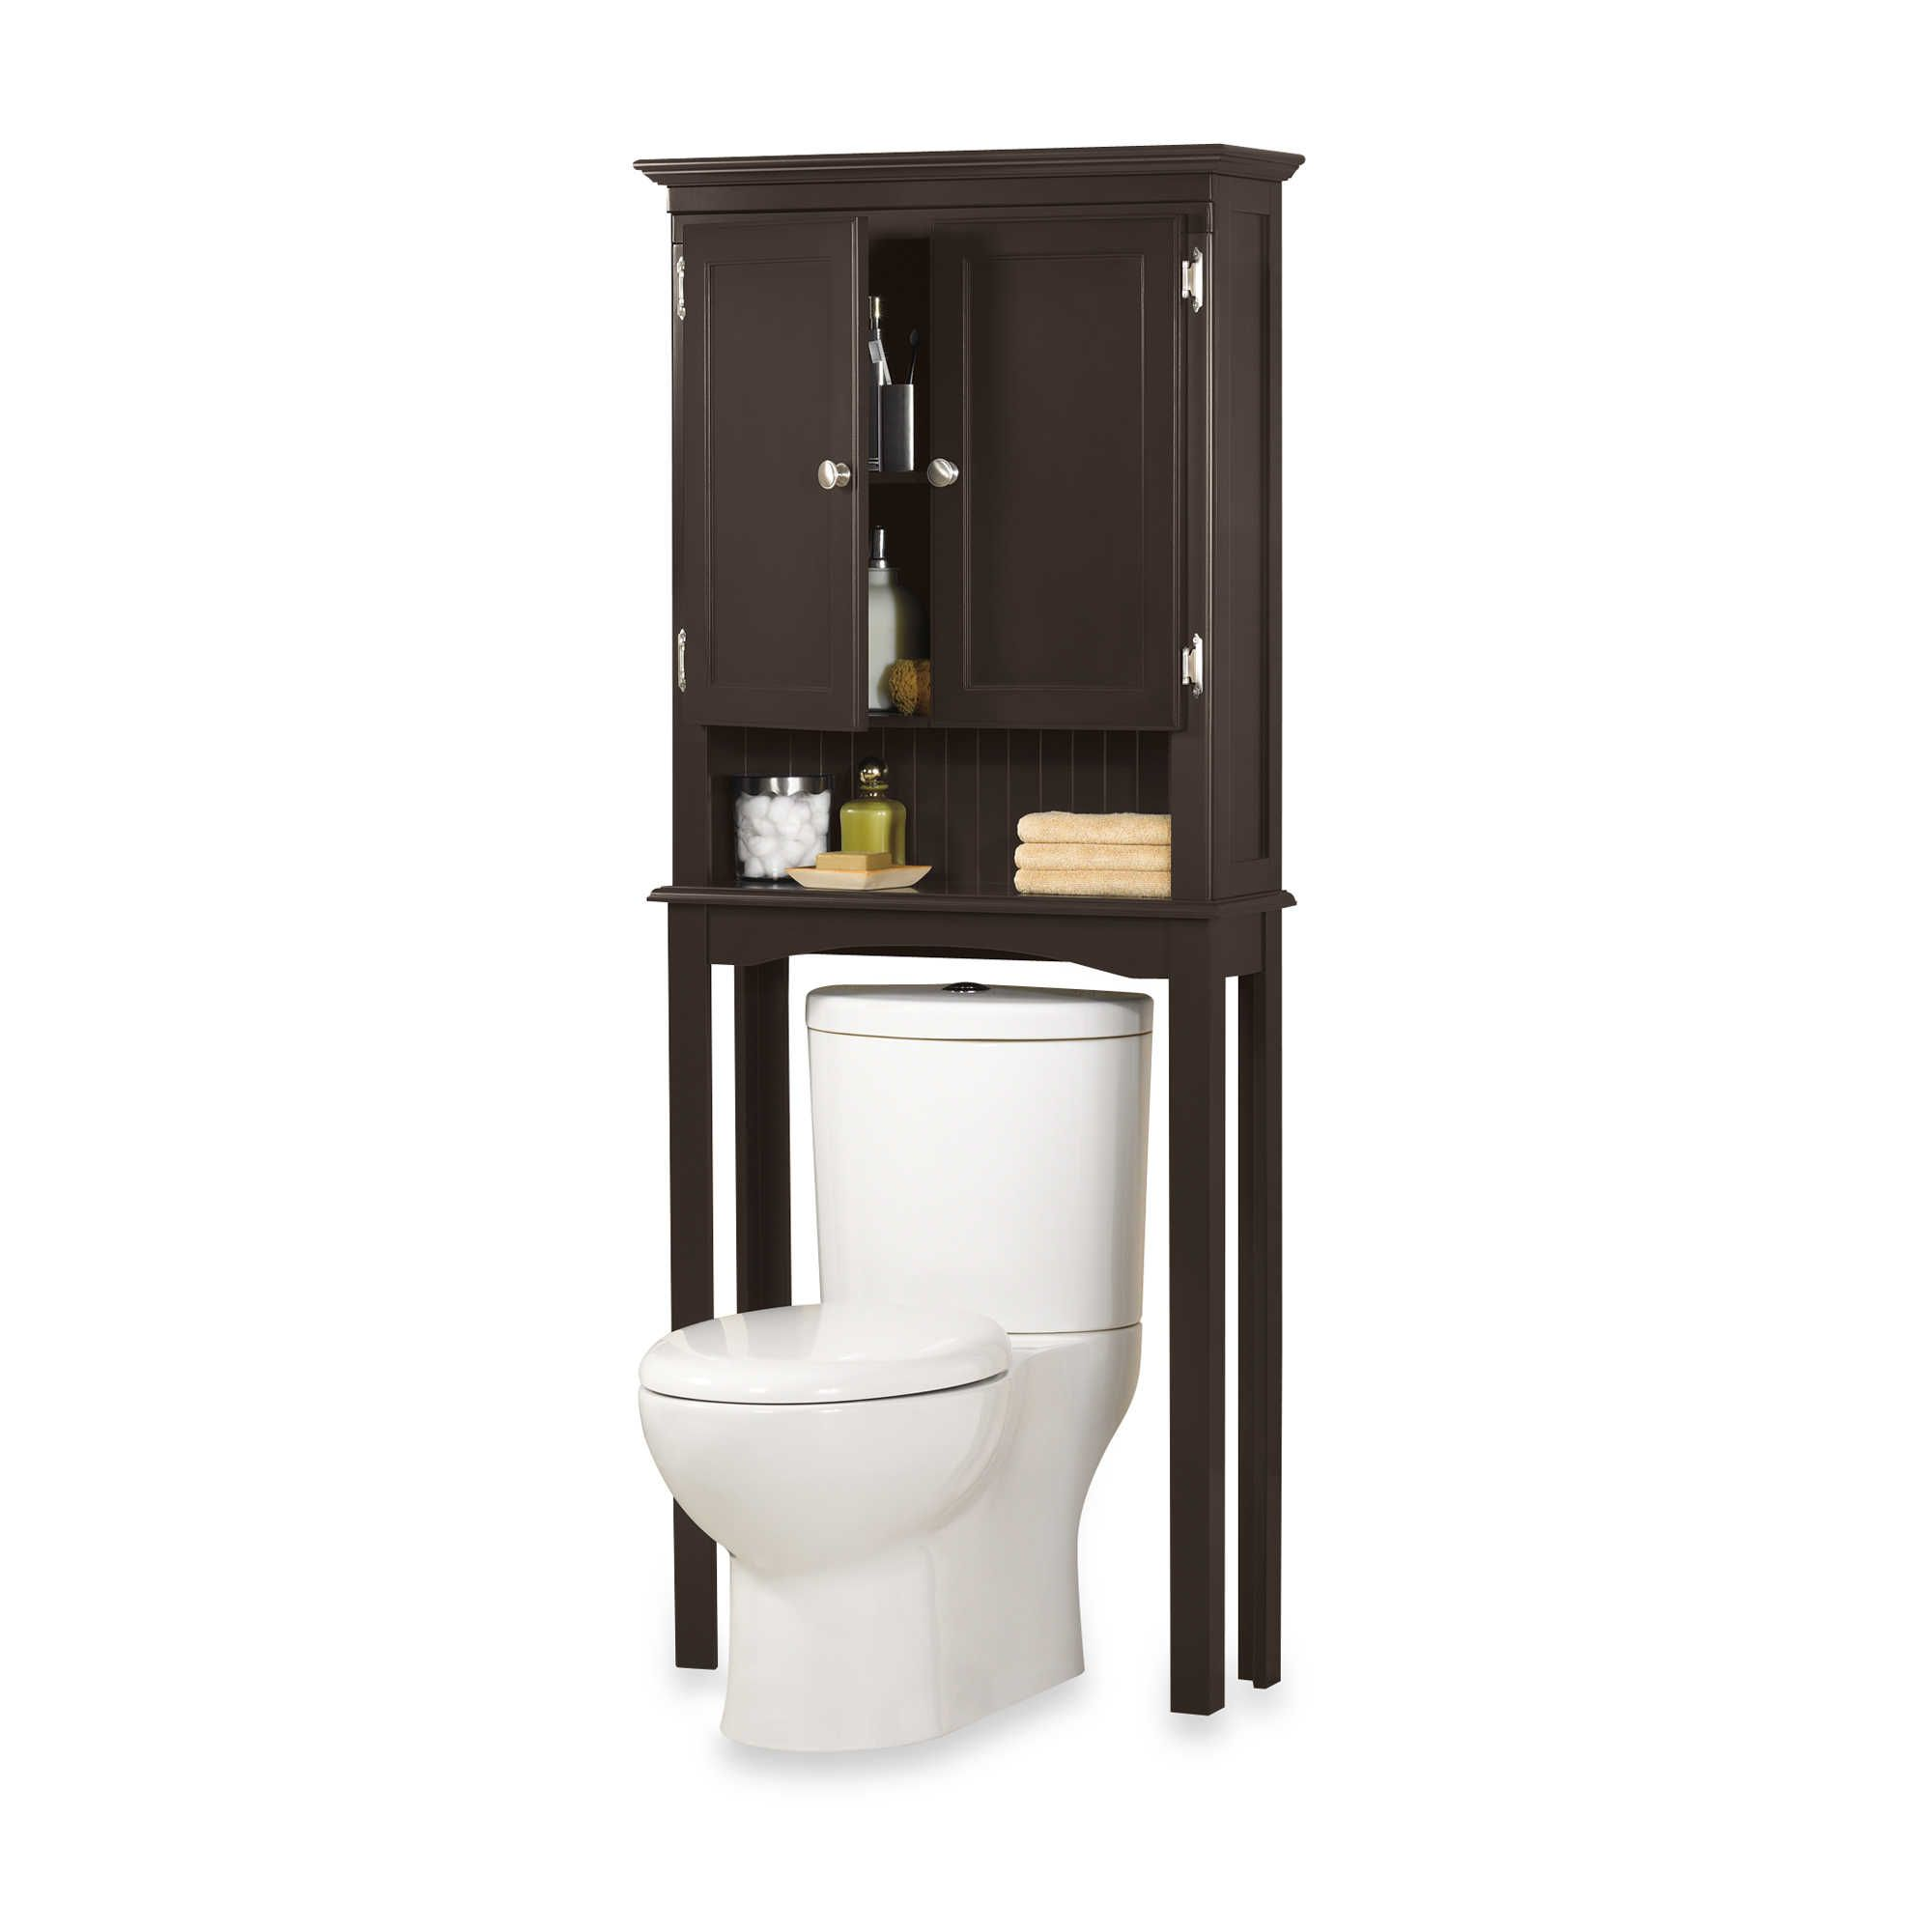 Fairmont Espresso Space Saver Bathroom Cabinet | to buy | Pinterest ...